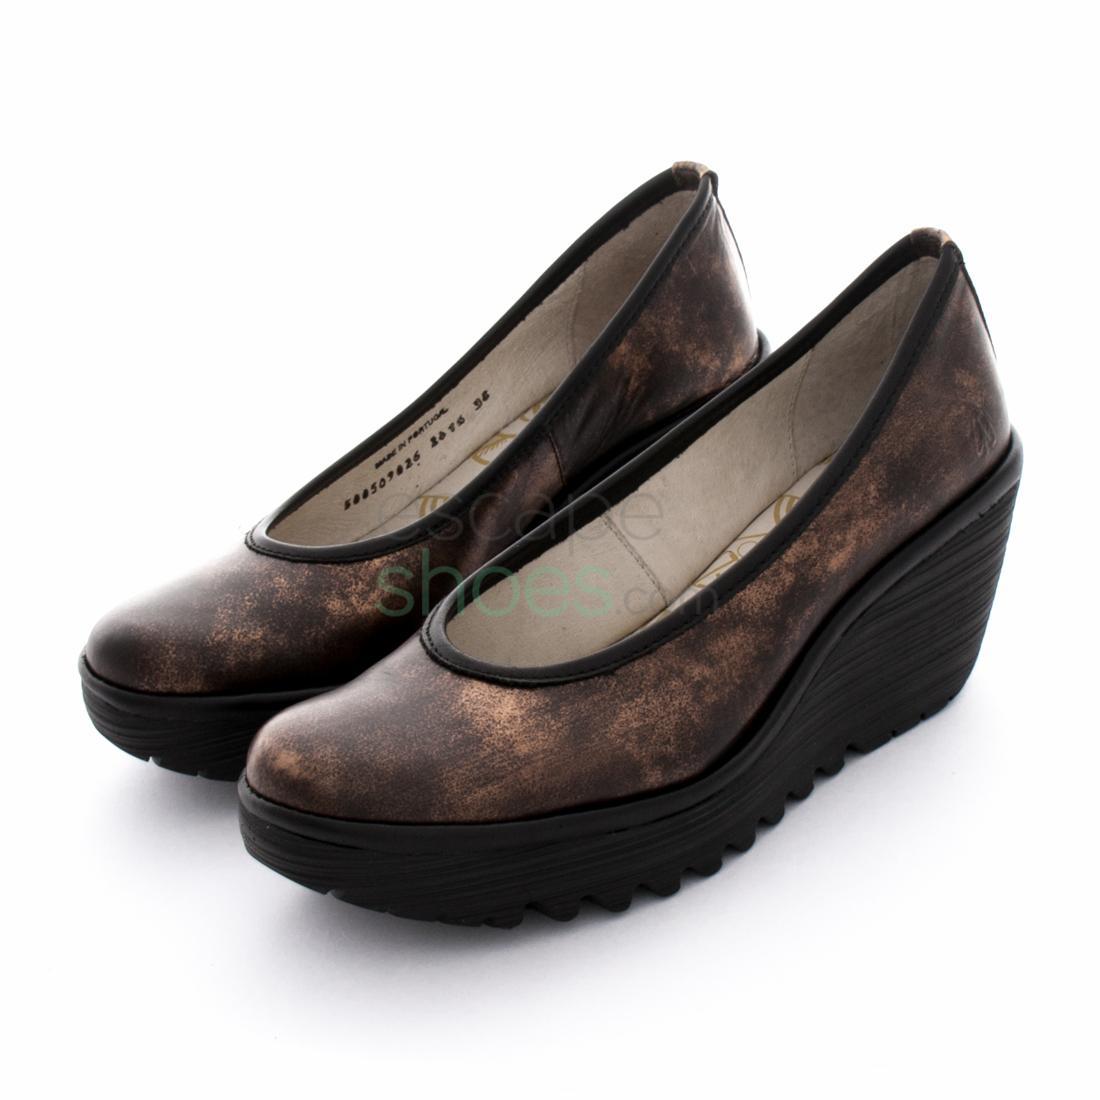 Yalu Compra Bronze Yellow Zapatos Tus Aquí Black Fly London wx6xqpRSAB